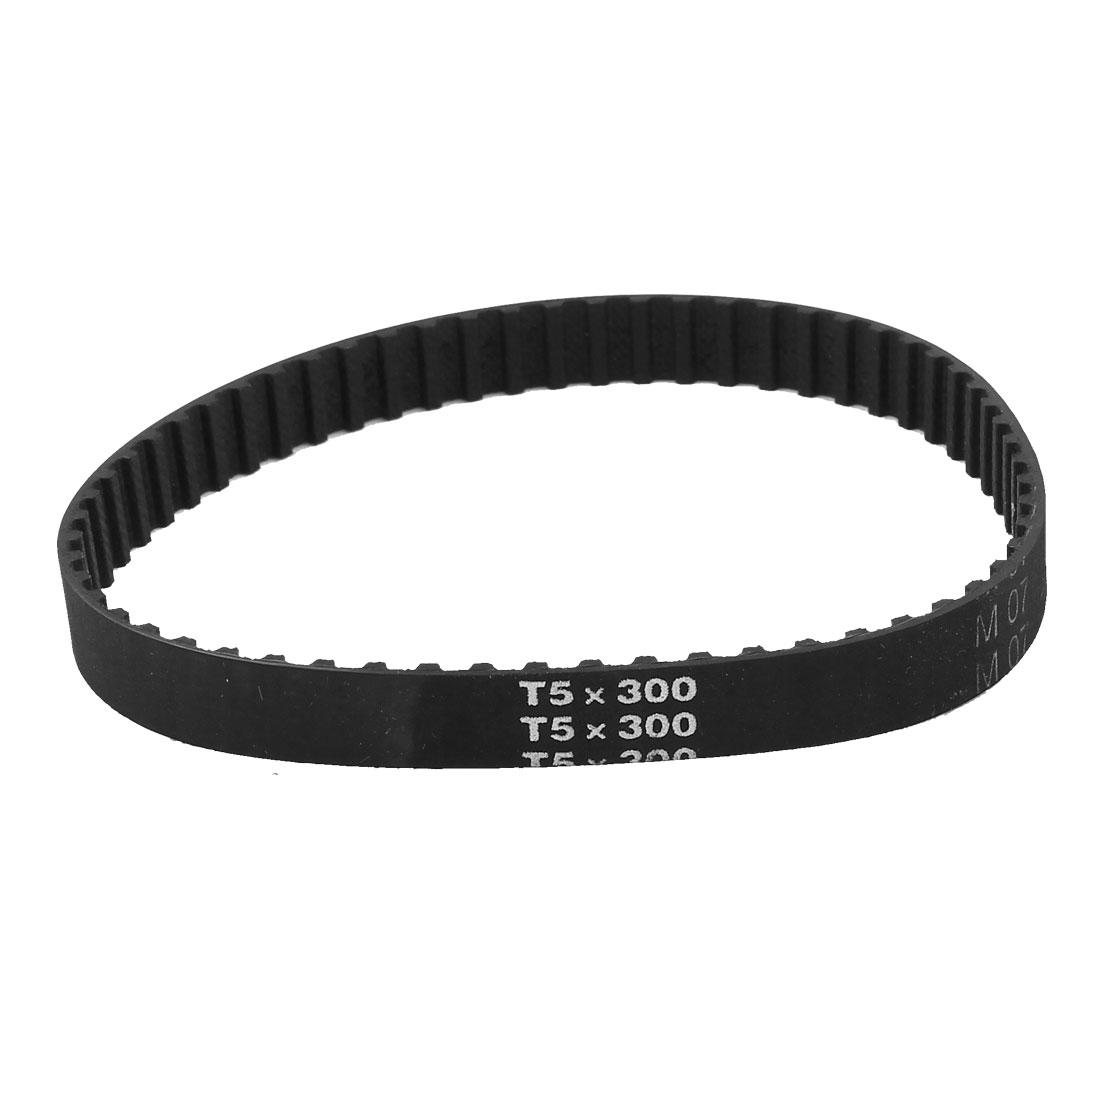 T5x300 60 Teeth 5mm Pitch 10mm Wide 300mm Girth Industrial Timing Belt